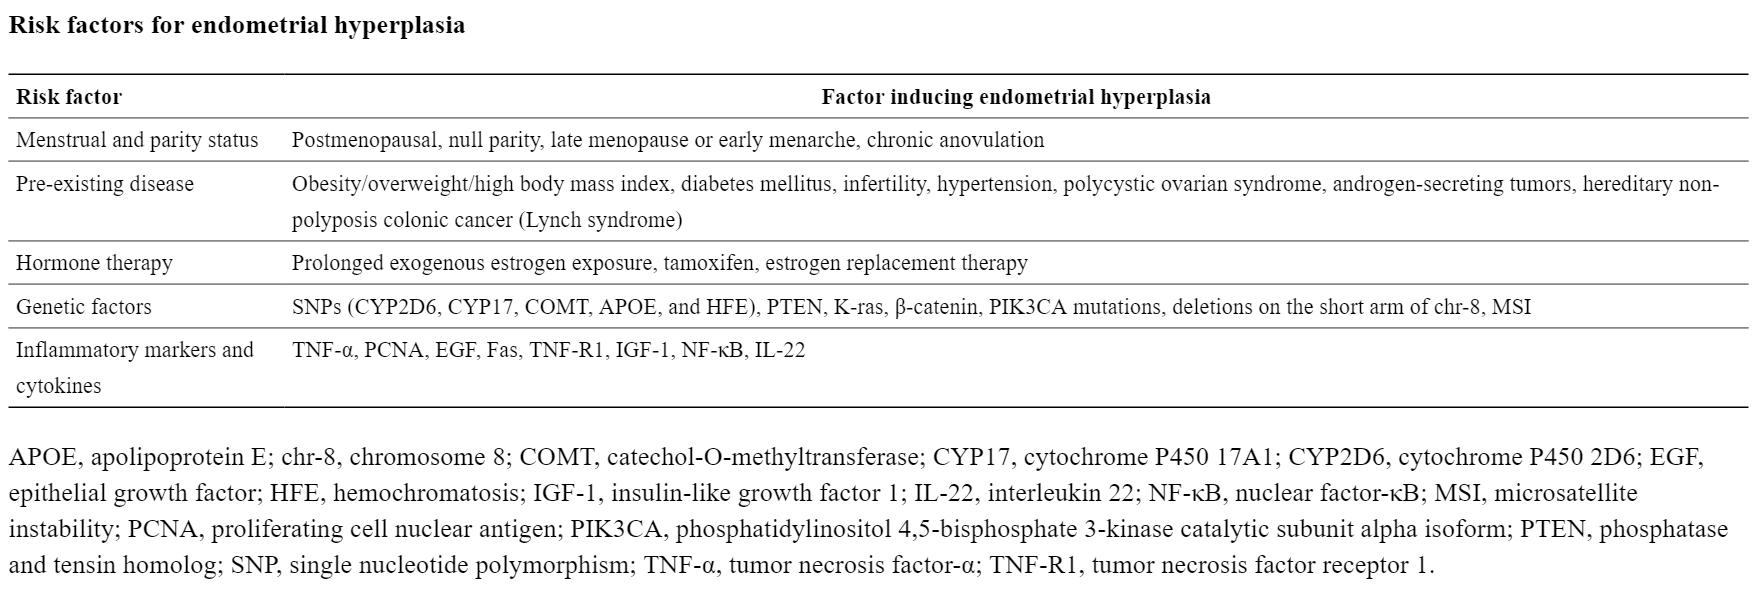 Glandular-cystic hyperplasia of the endometrium. Causes, symptoms, therapy 4